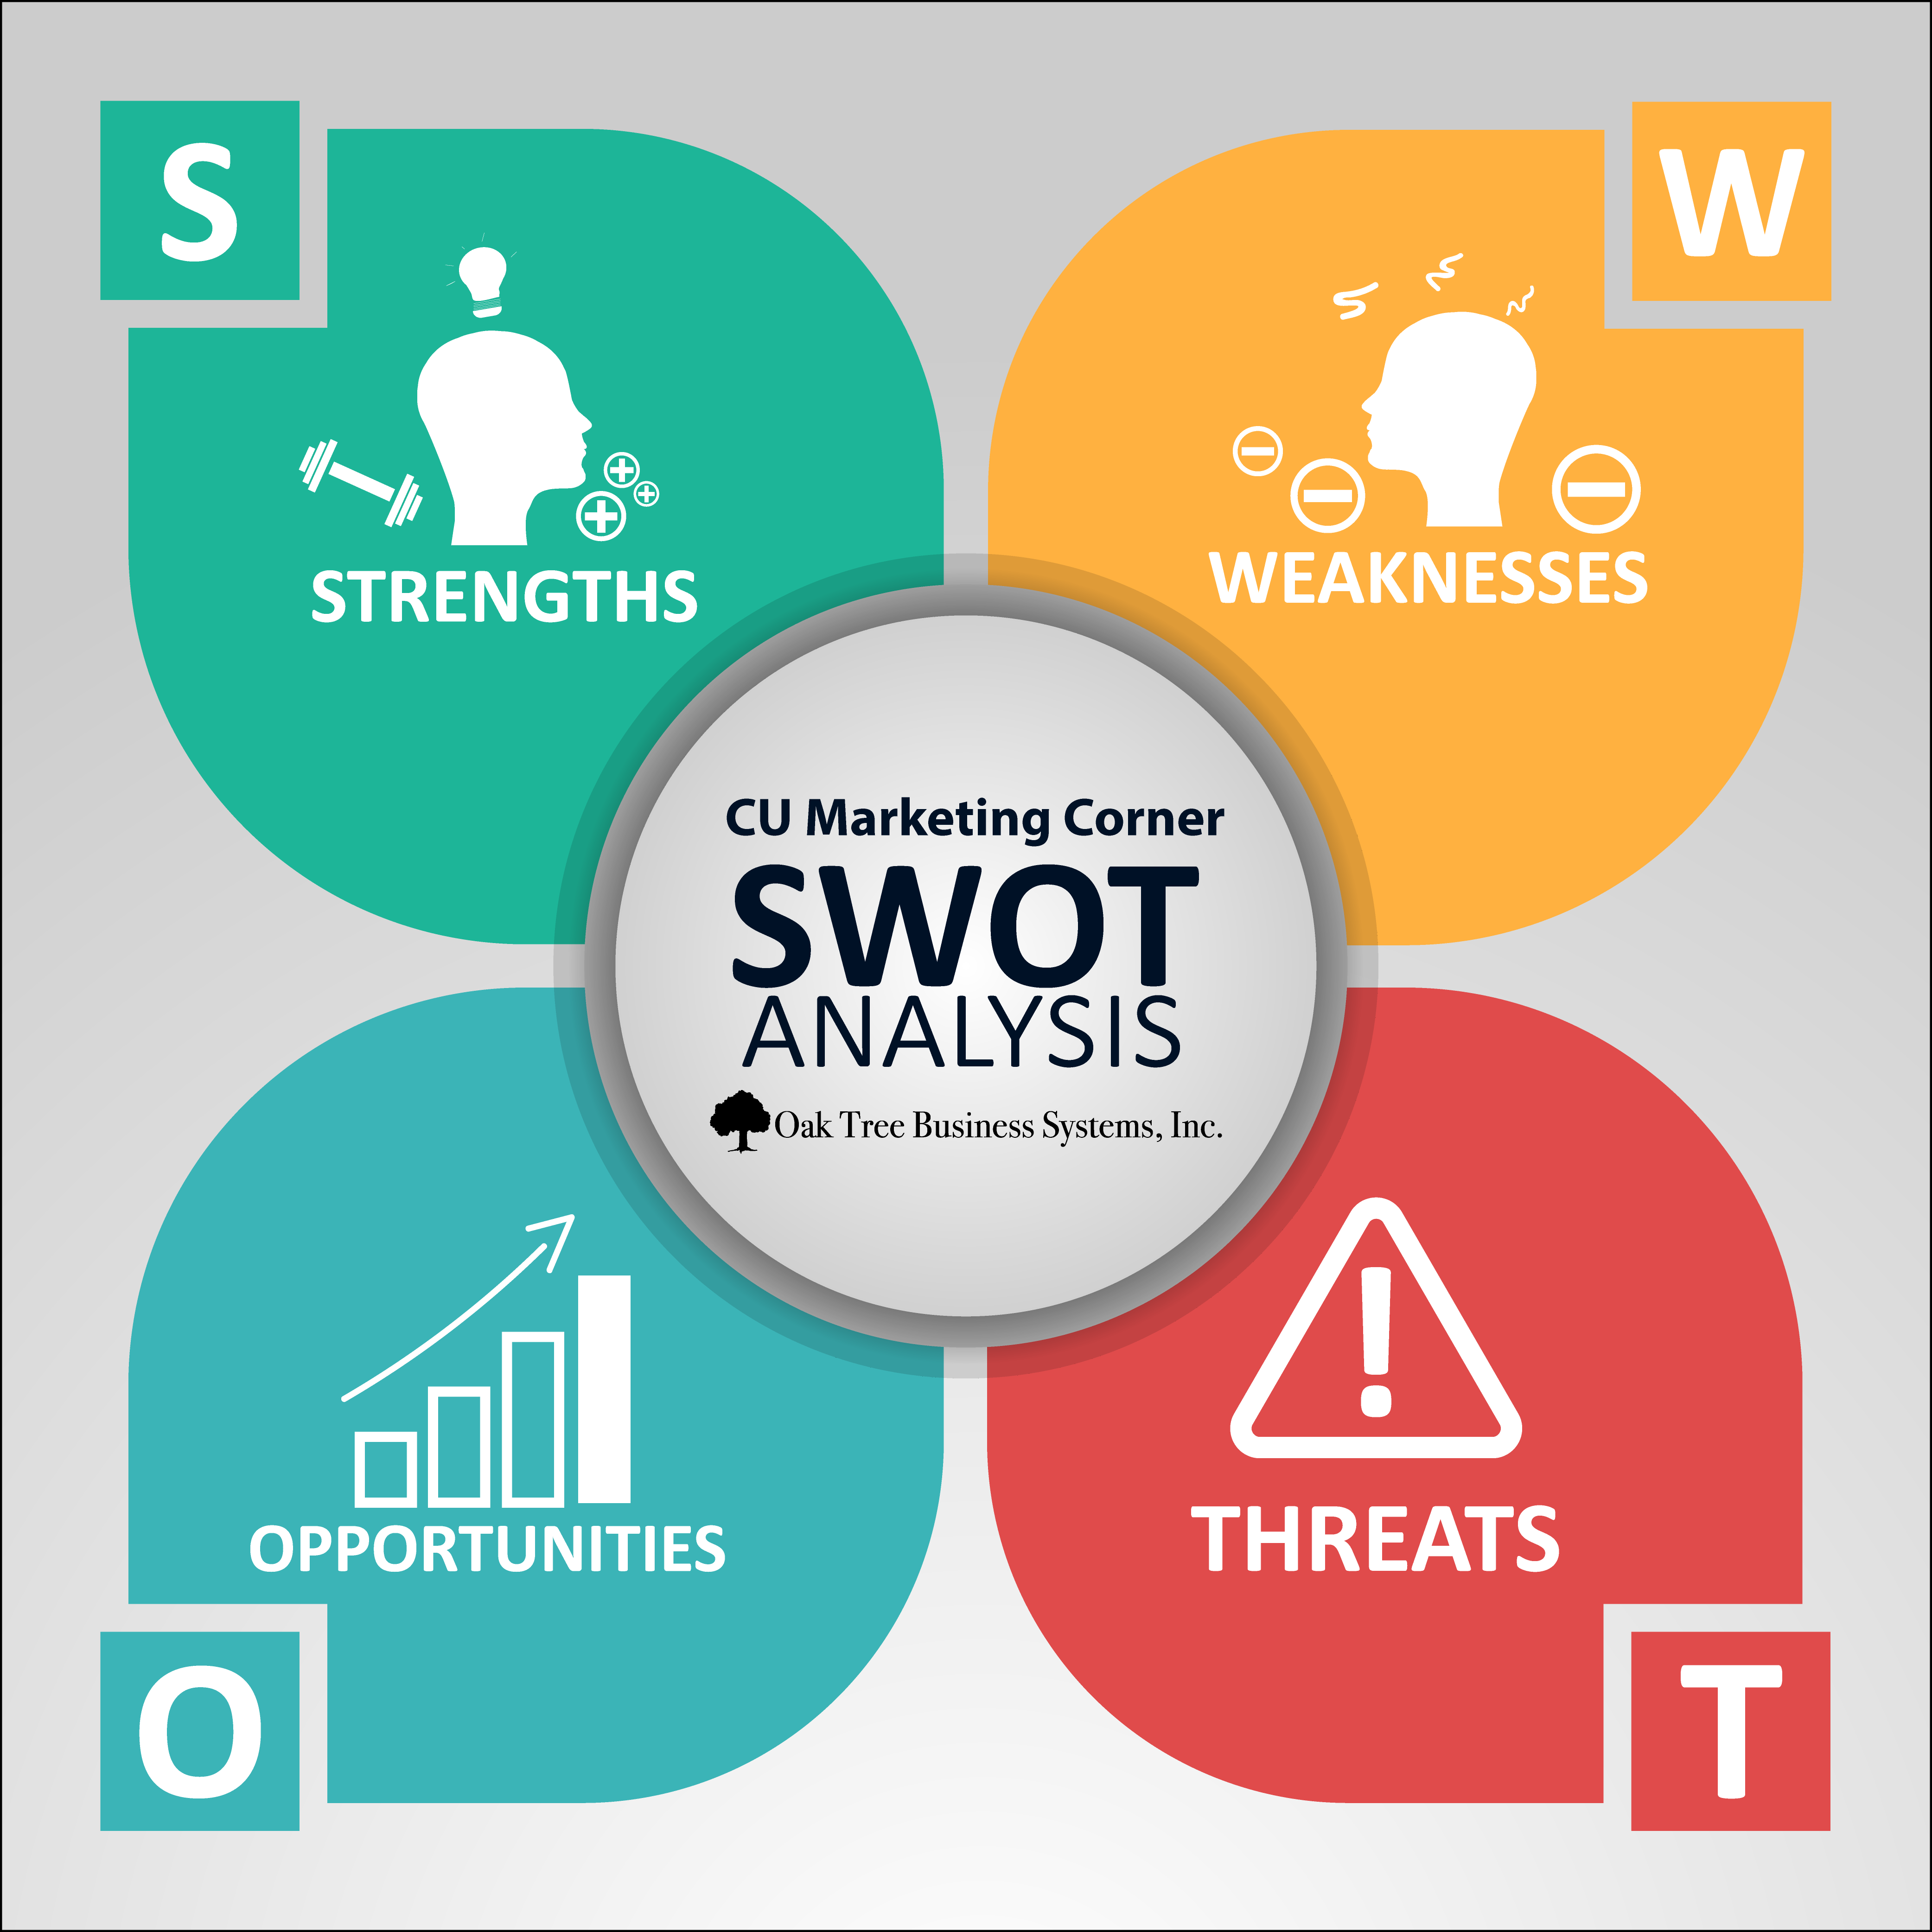 Cu Marketing Corner Swot Analysis Oak Tree Business Systems Credit Union Marketing Credit Union Business Systems